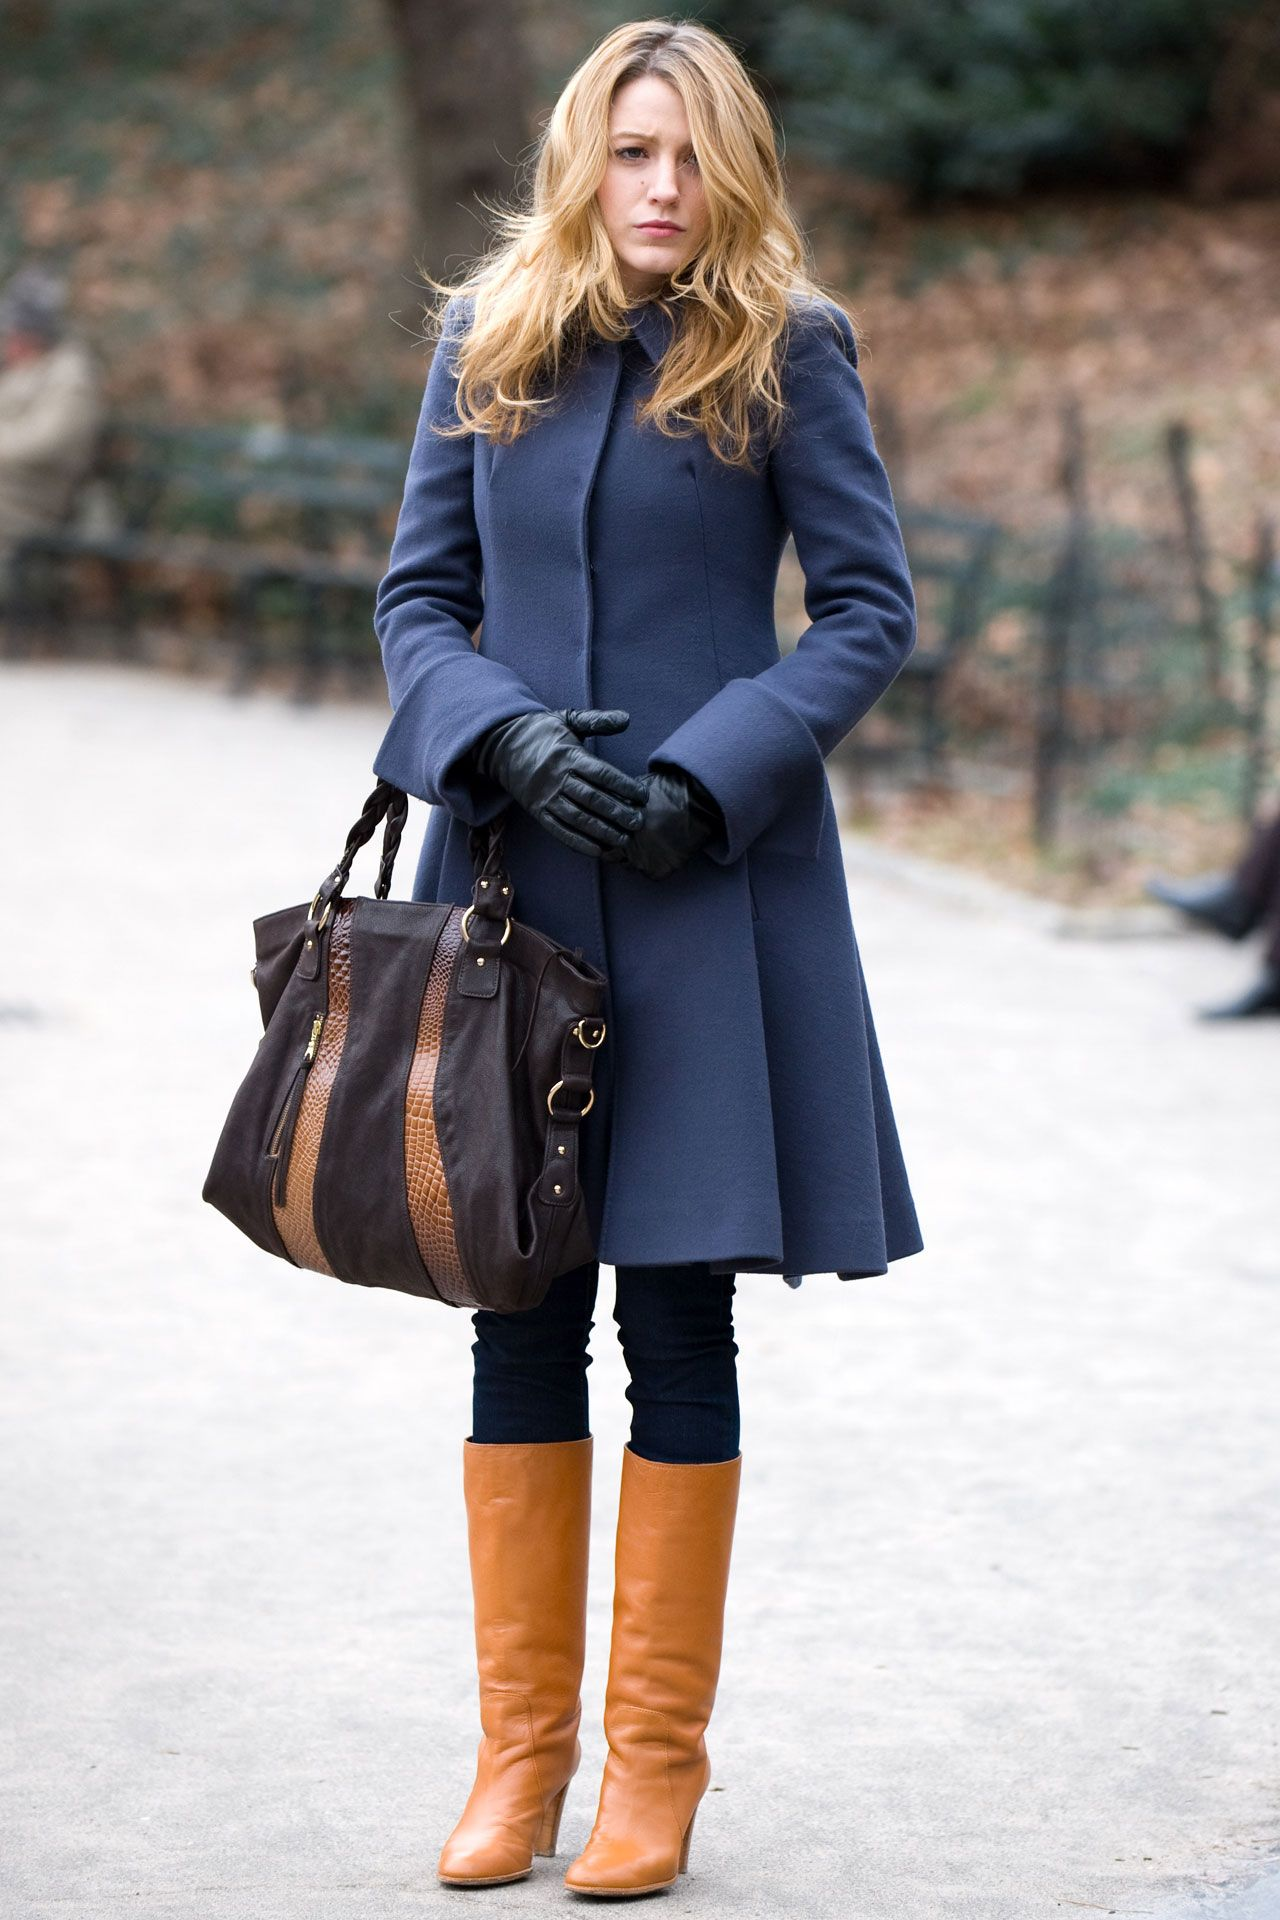 Guardaroba Gossip Girl.Gossip Girl Style War Serena V Blair Gossip Girl Fashion